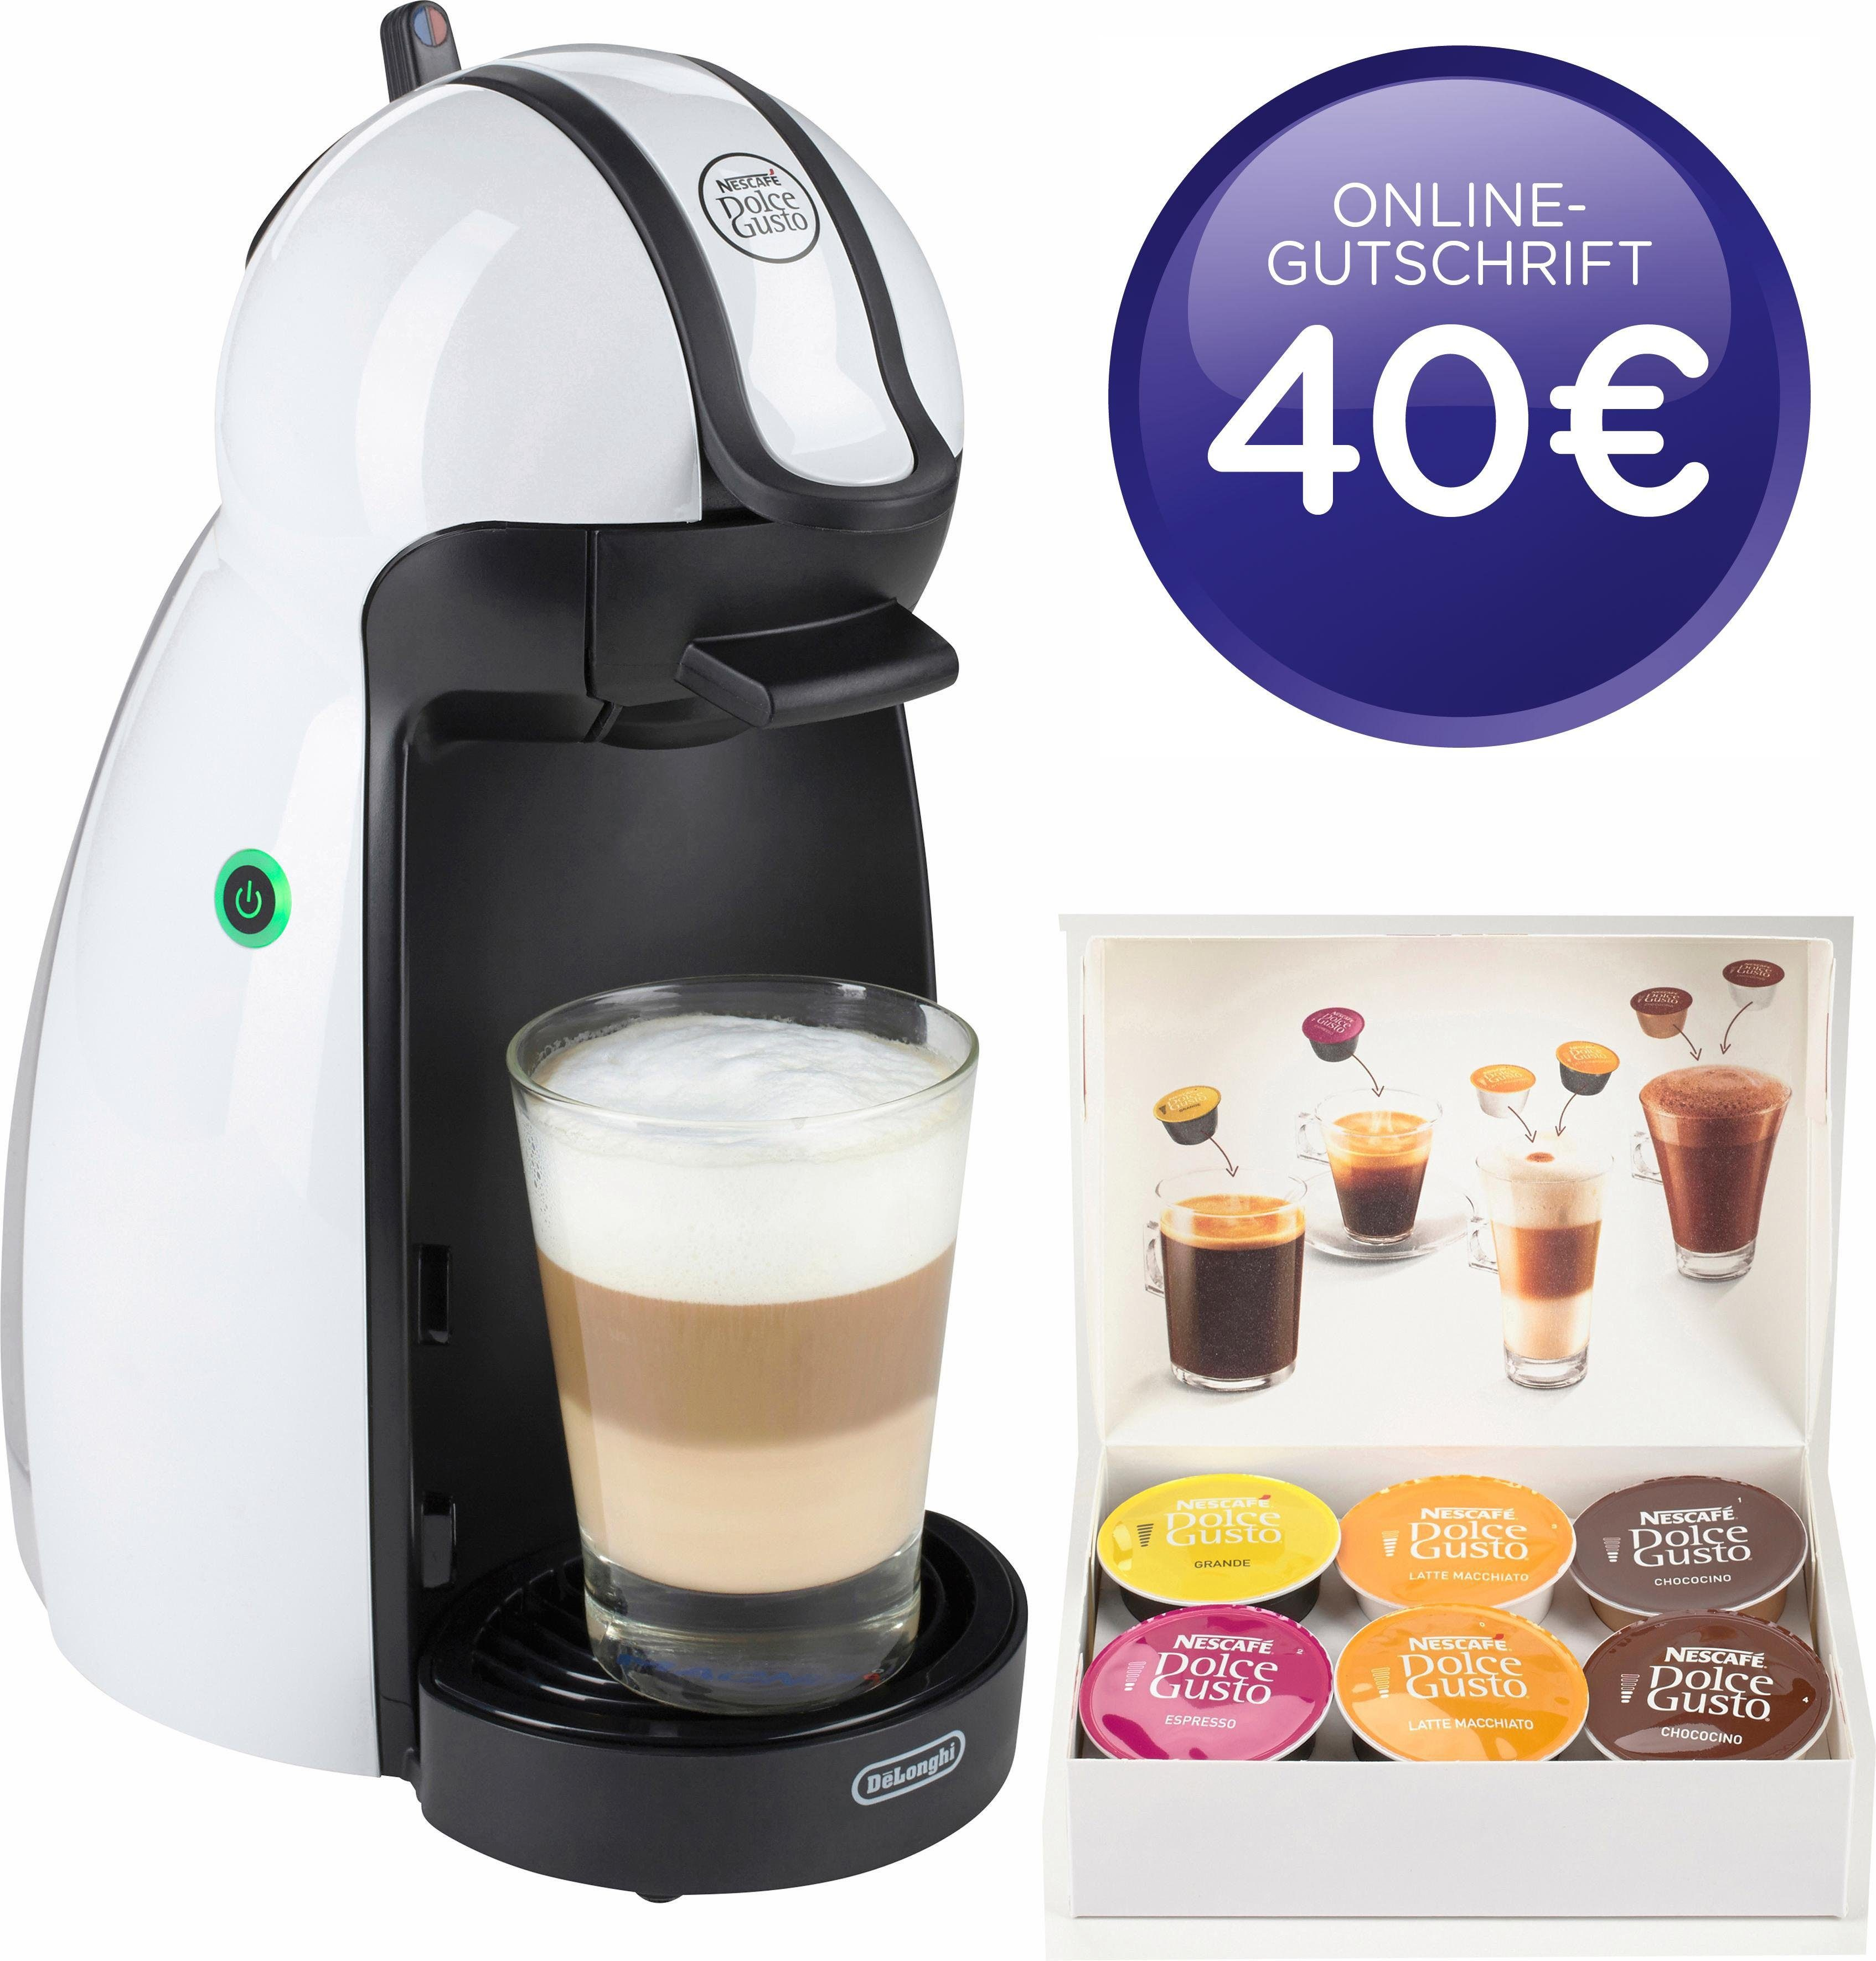 Nescafé Dolce Gusto Kapselmaschine NESCAFÉ® Dolce Gusto® EDG 100.W, inkl. 40€ Online-Gutschrift